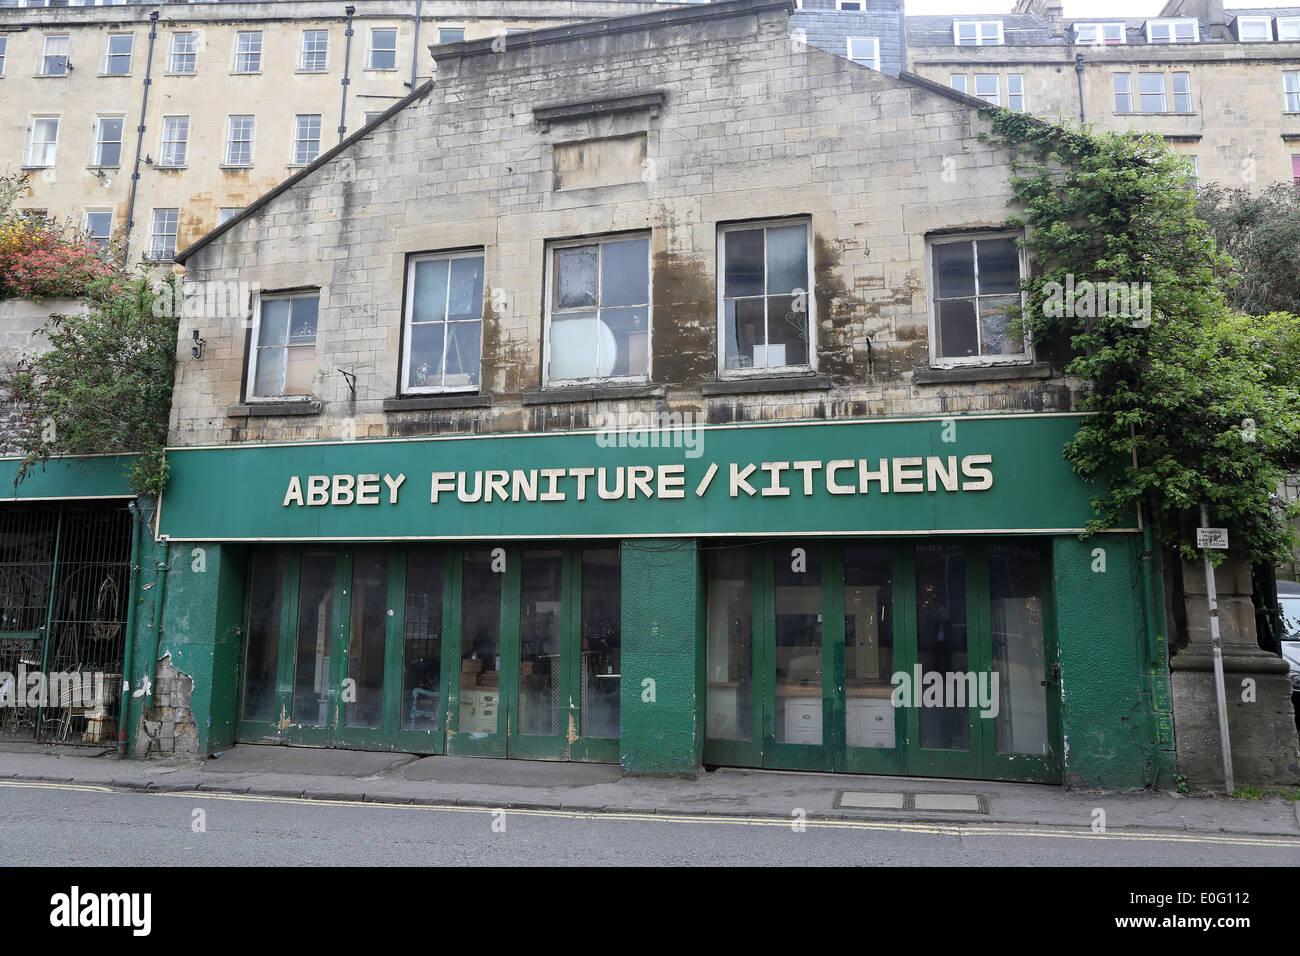 Bath City Centre Shop Stock Photos & Bath City Centre Shop Stock ...